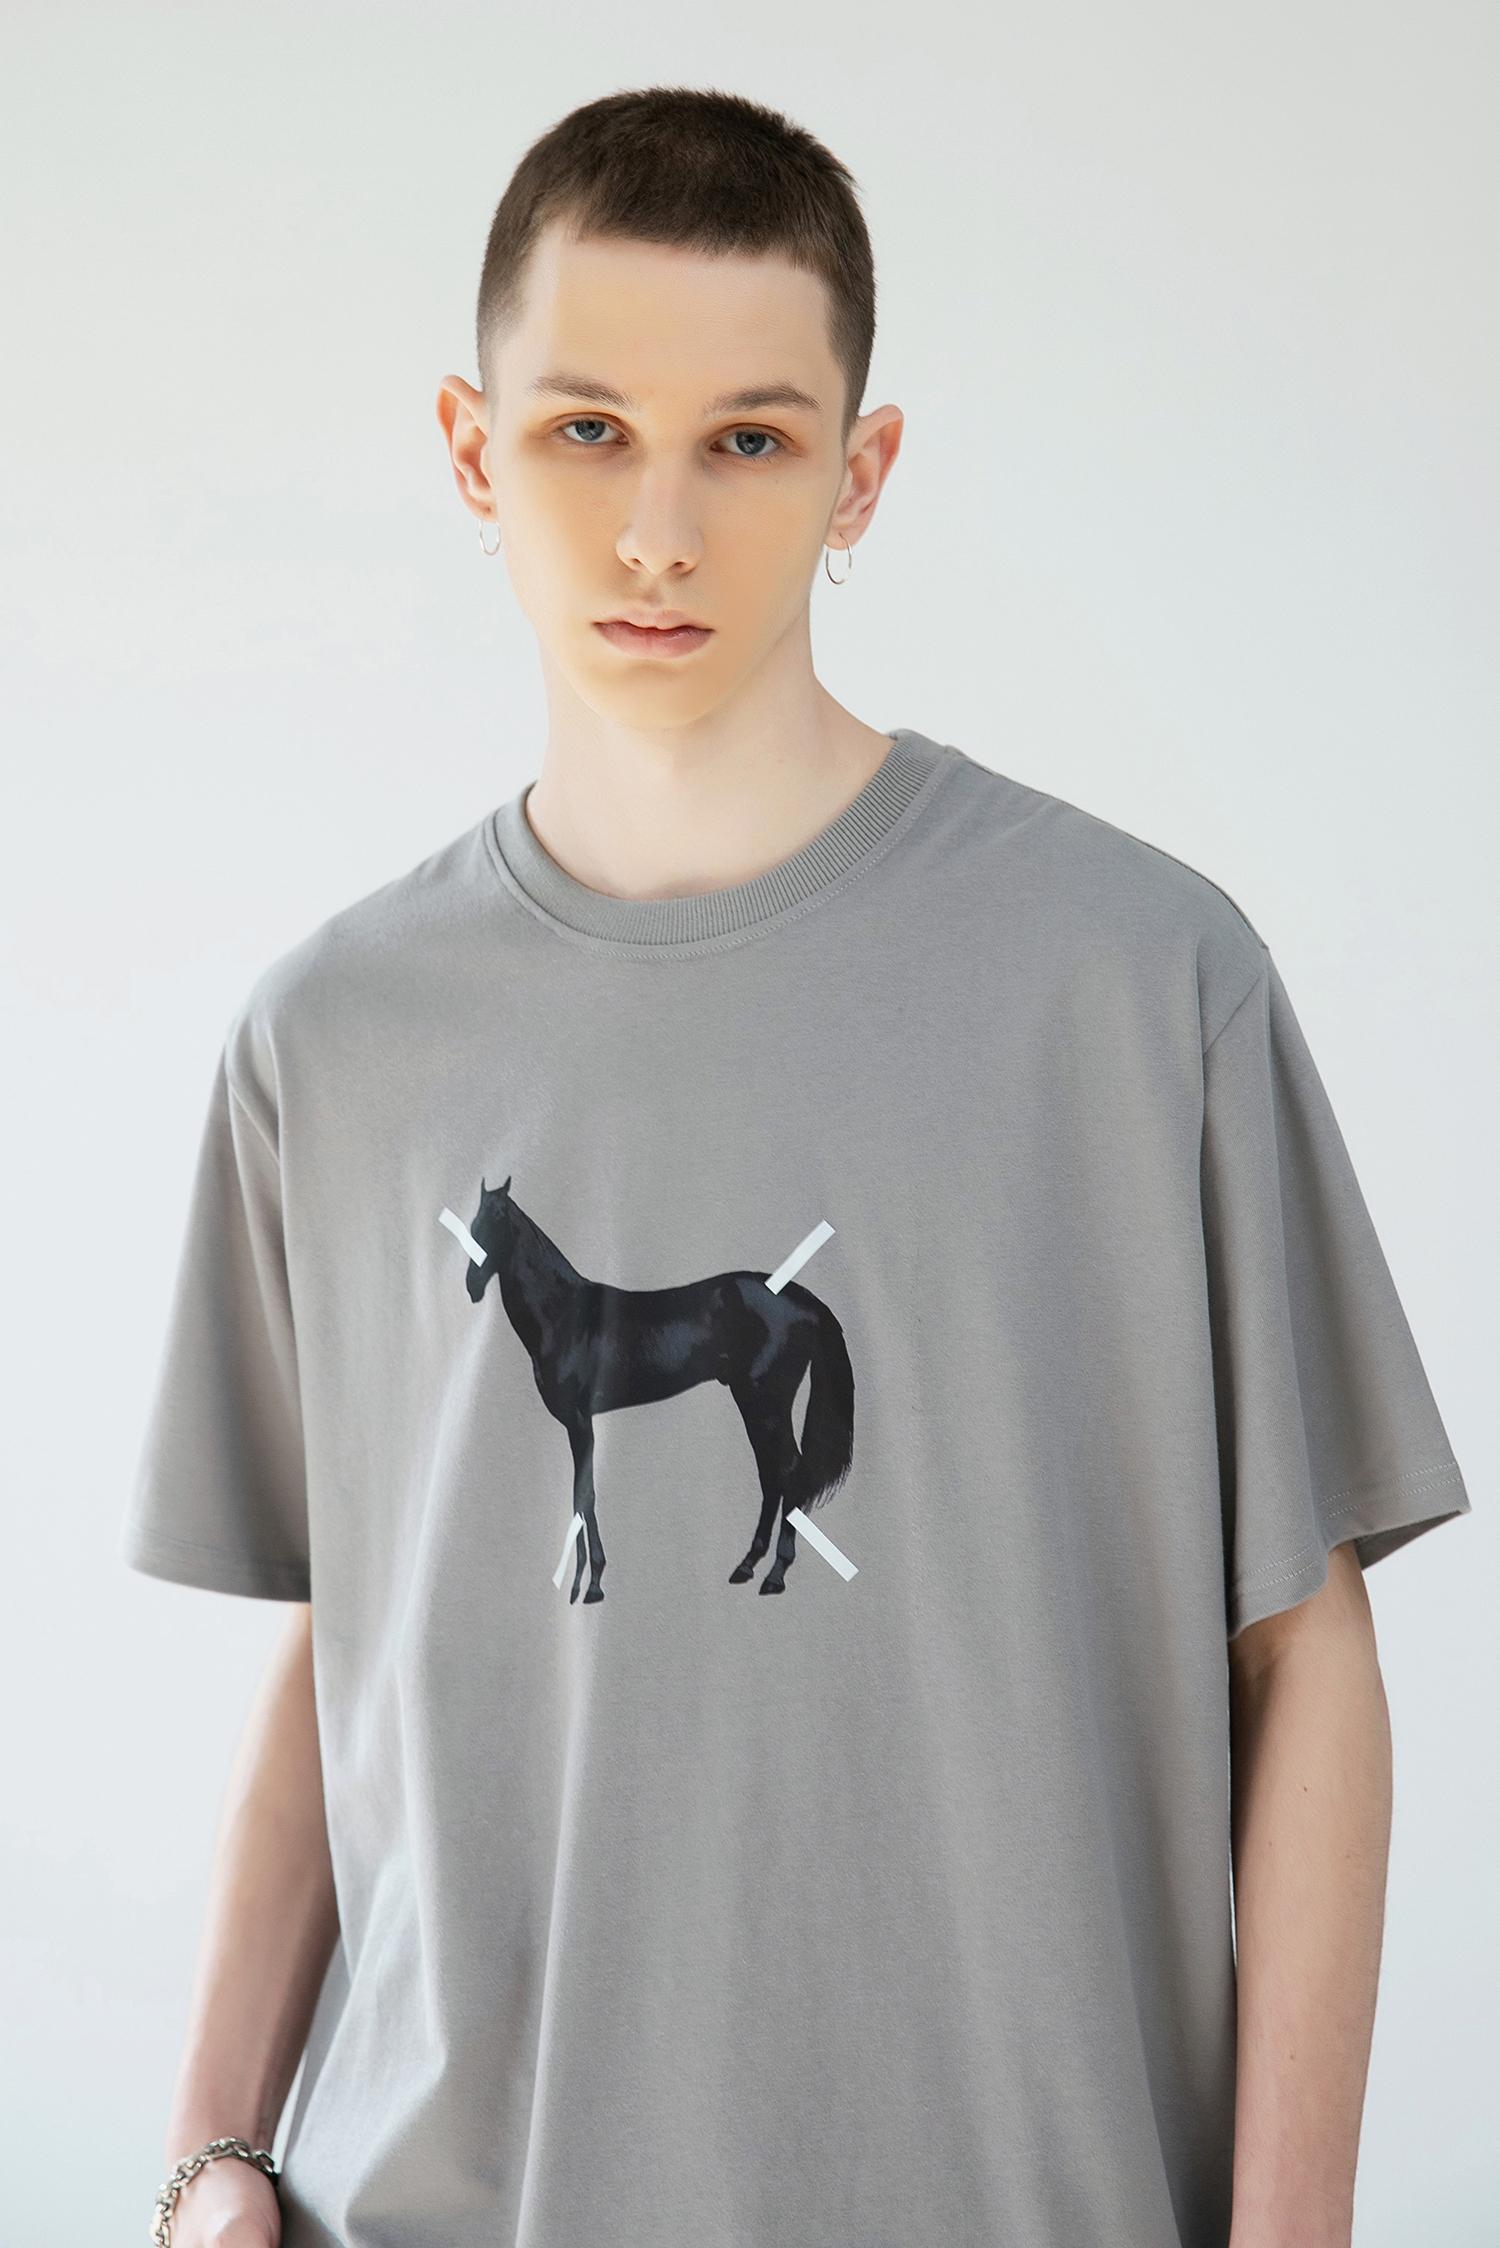 GRINCH1928「GAHA」美式雕塑马印花石板灰短袖T恤男女宽松休闲TEE(「GAHA」美式雕塑马印花石板灰短袖)